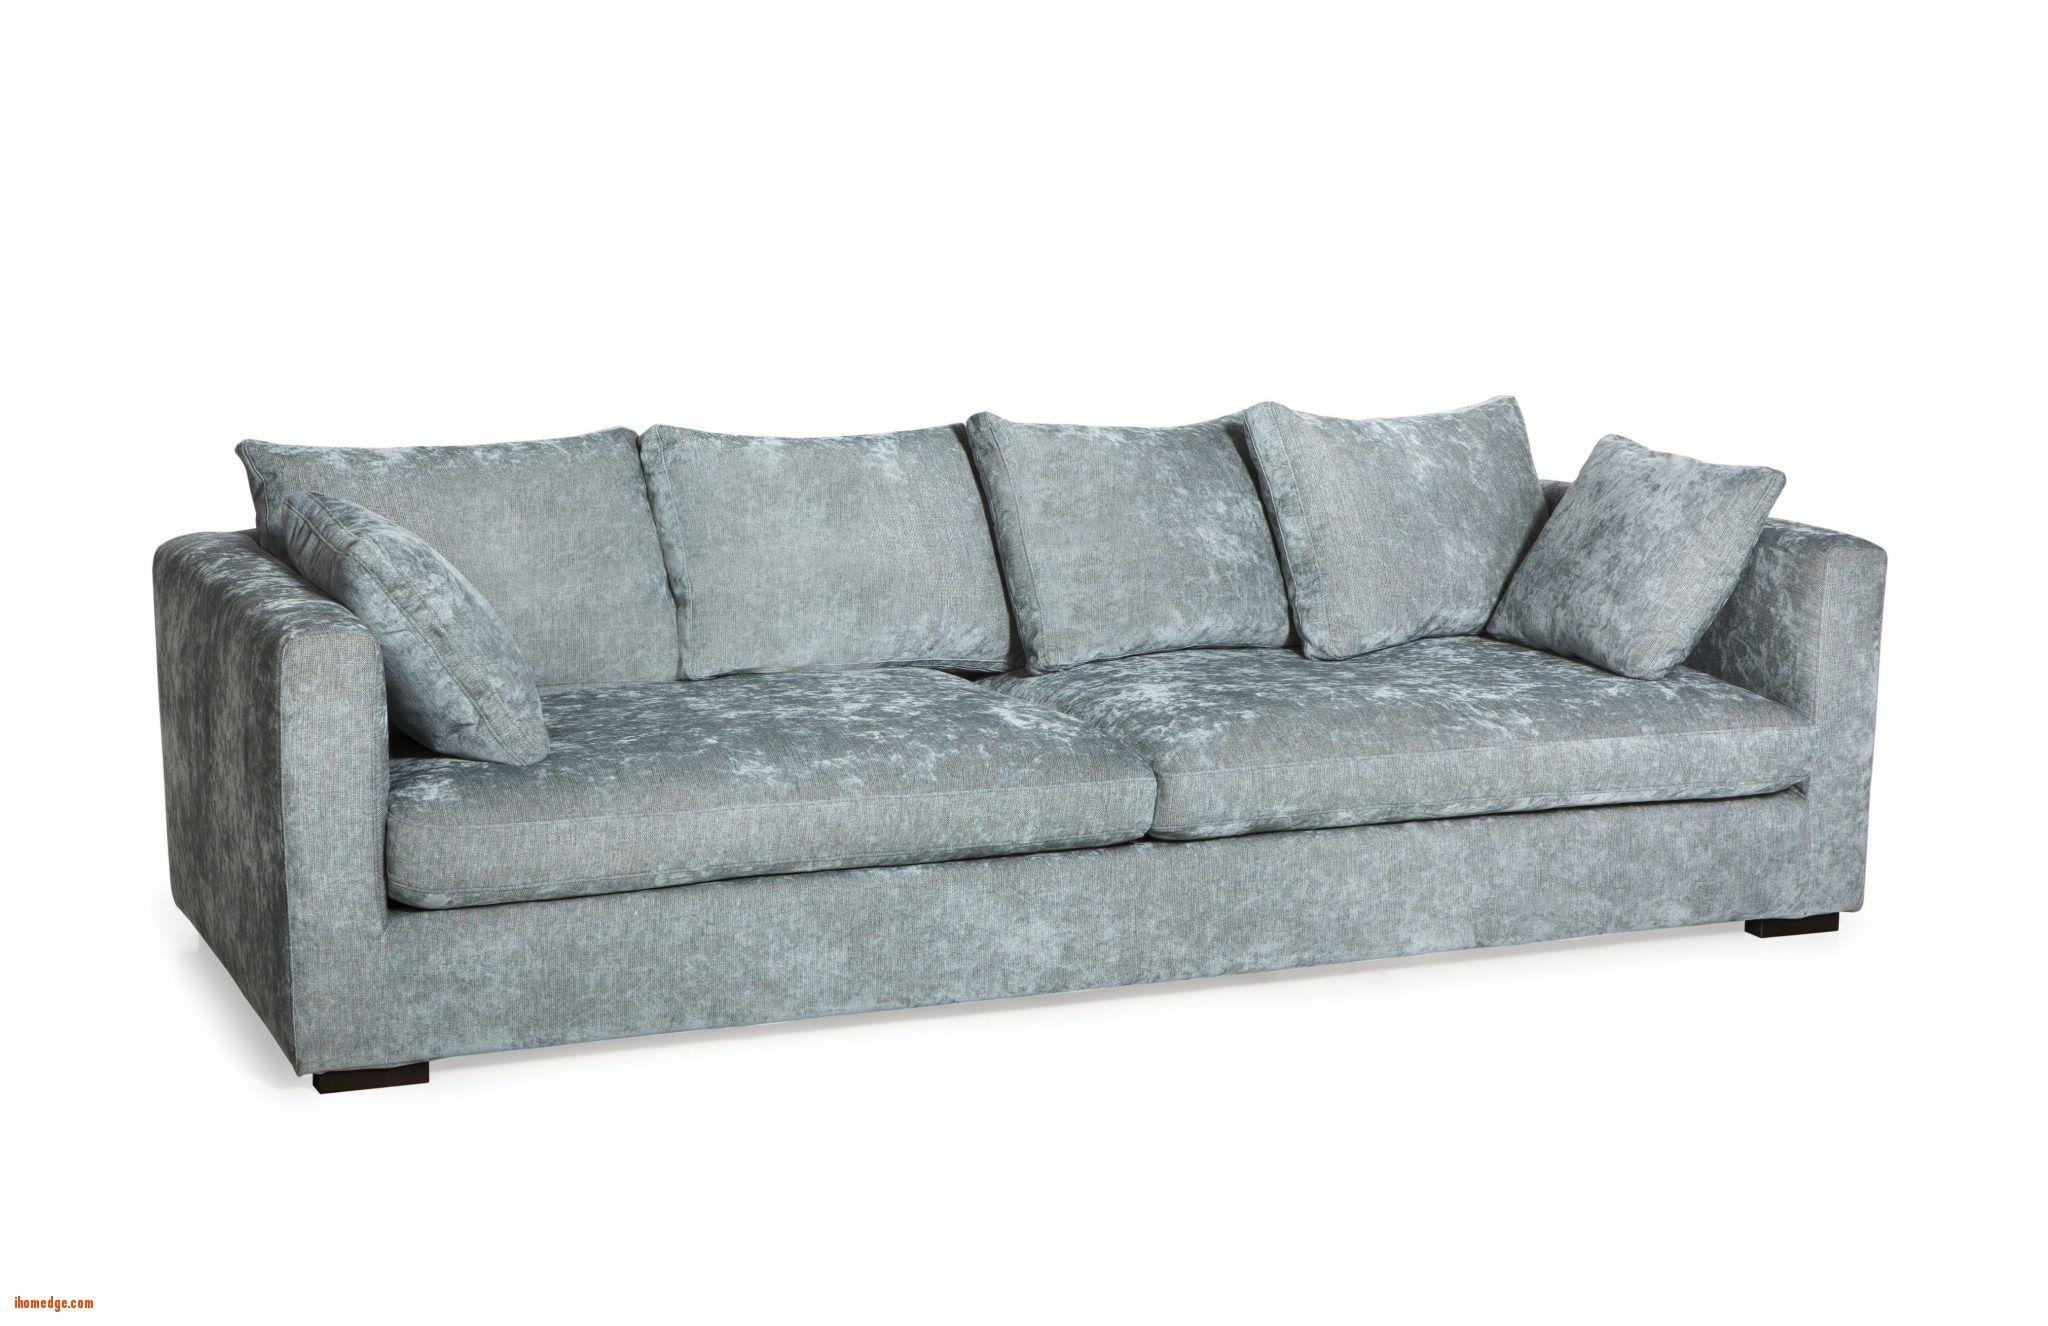 Pin by ihomedge on Sofa & Couch   Comfortable sofa, Sofa, Sofa pillows